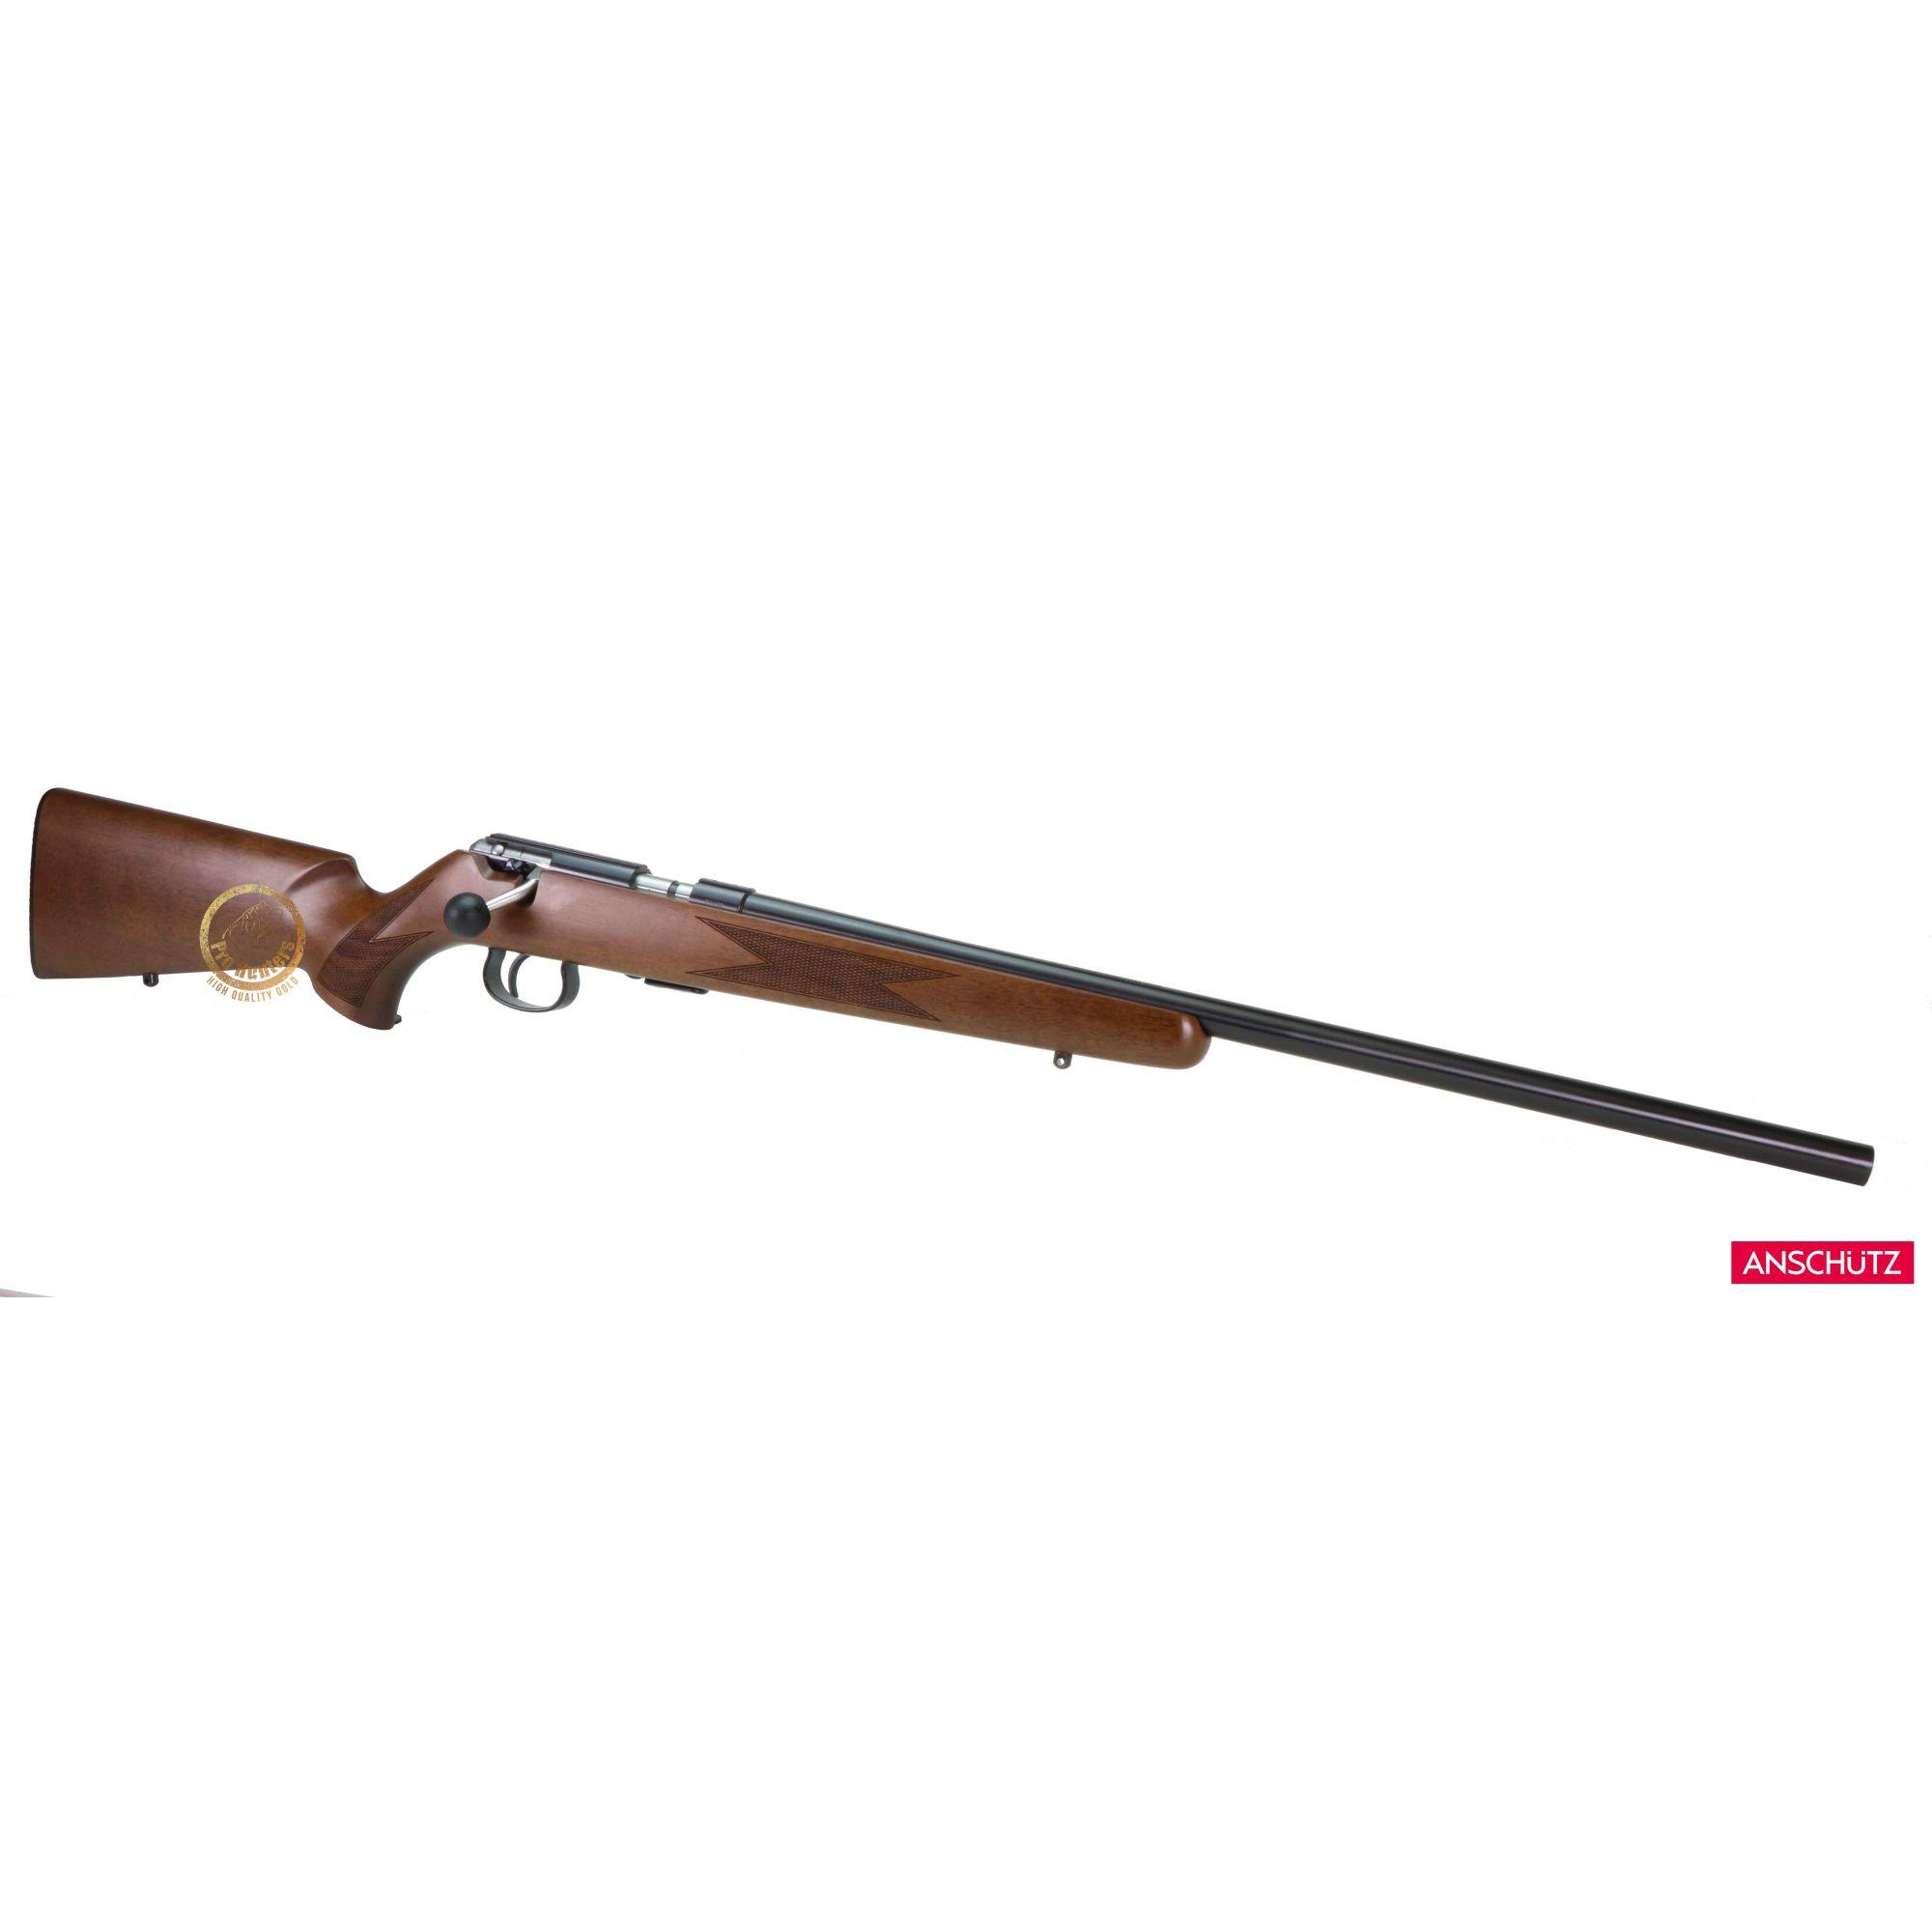 Rifle Anschutz 1416 D Walnut Classic - Cano 23